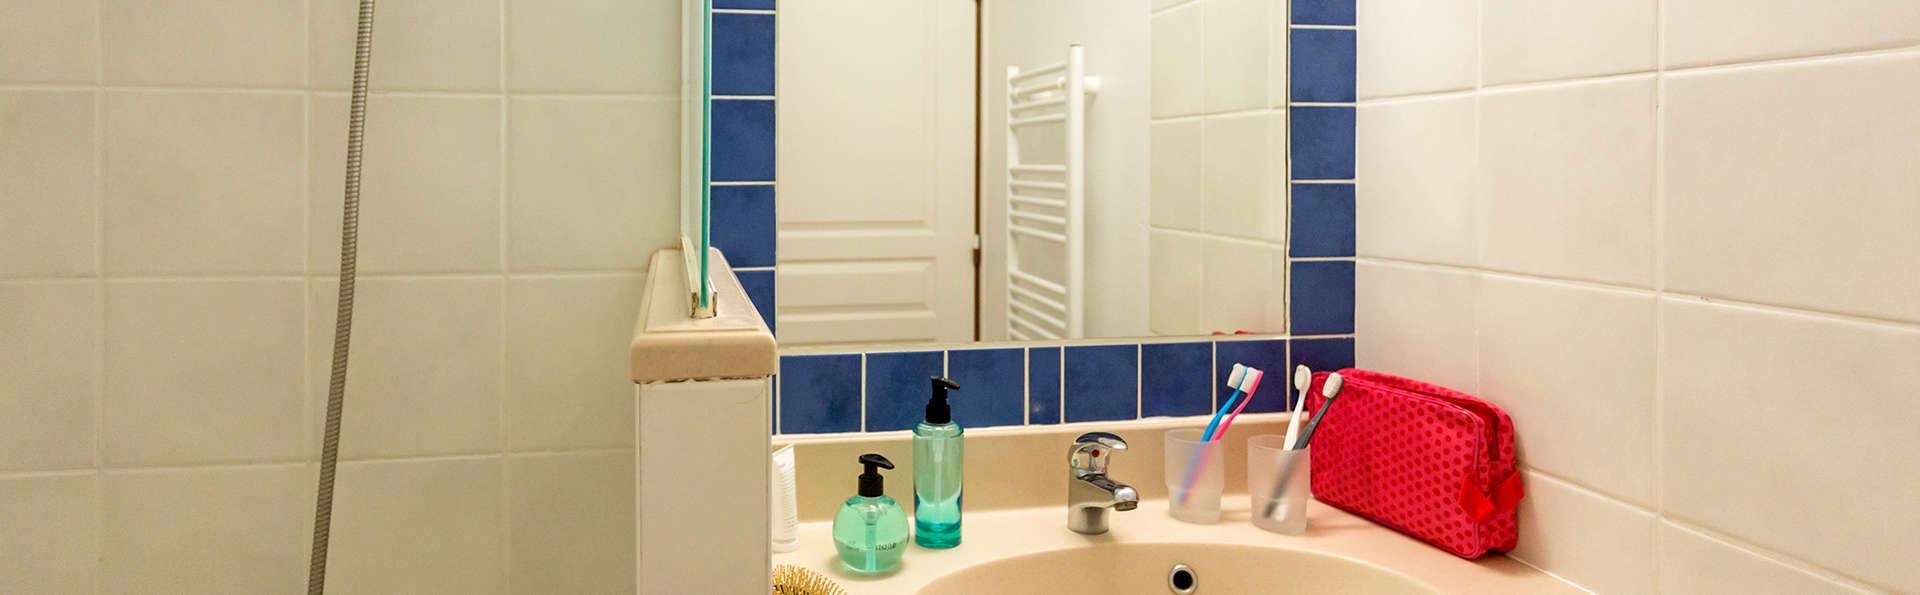 Pierre Et Vacances Bleu Marine - Edit_Bathroom2.jpg